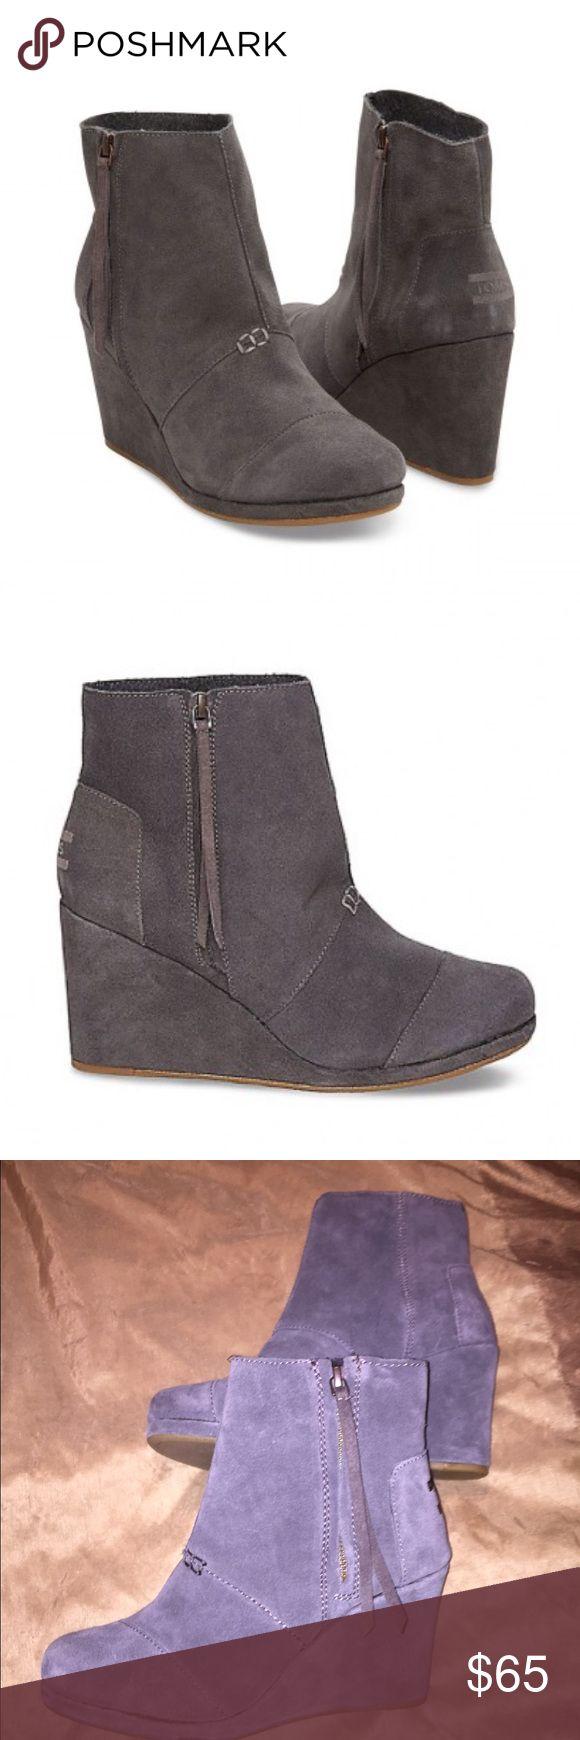 NWOT Toms Desert wedge booties! NWOT Toms desert wedge booties! Super cute! Heel was just too high for me 😭 TOMS Shoes Ankle Boots & Booties